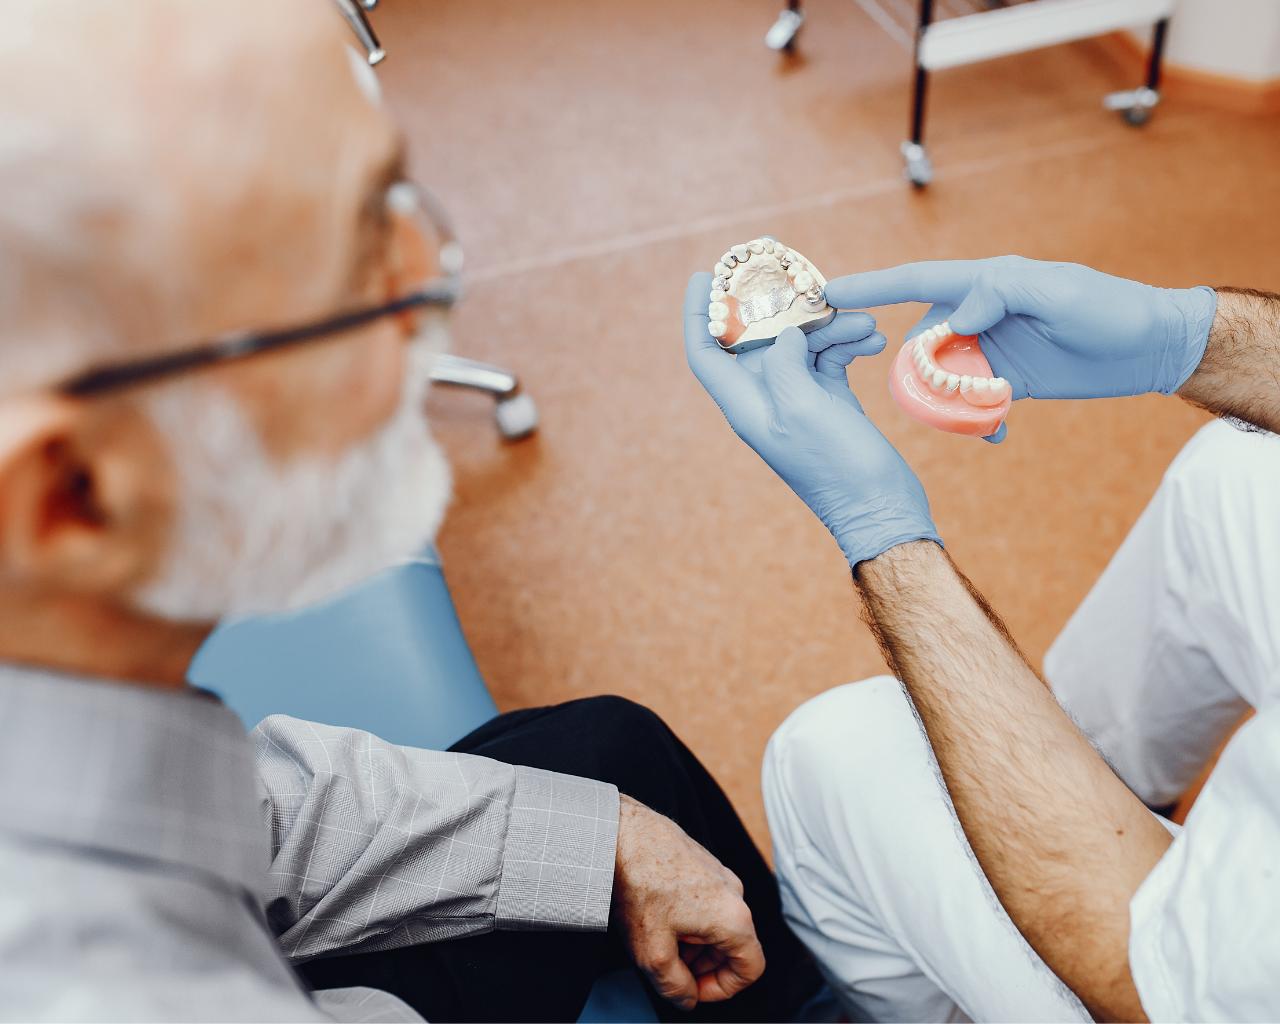 Sexto Simposio Internacional de Odontogeriatría